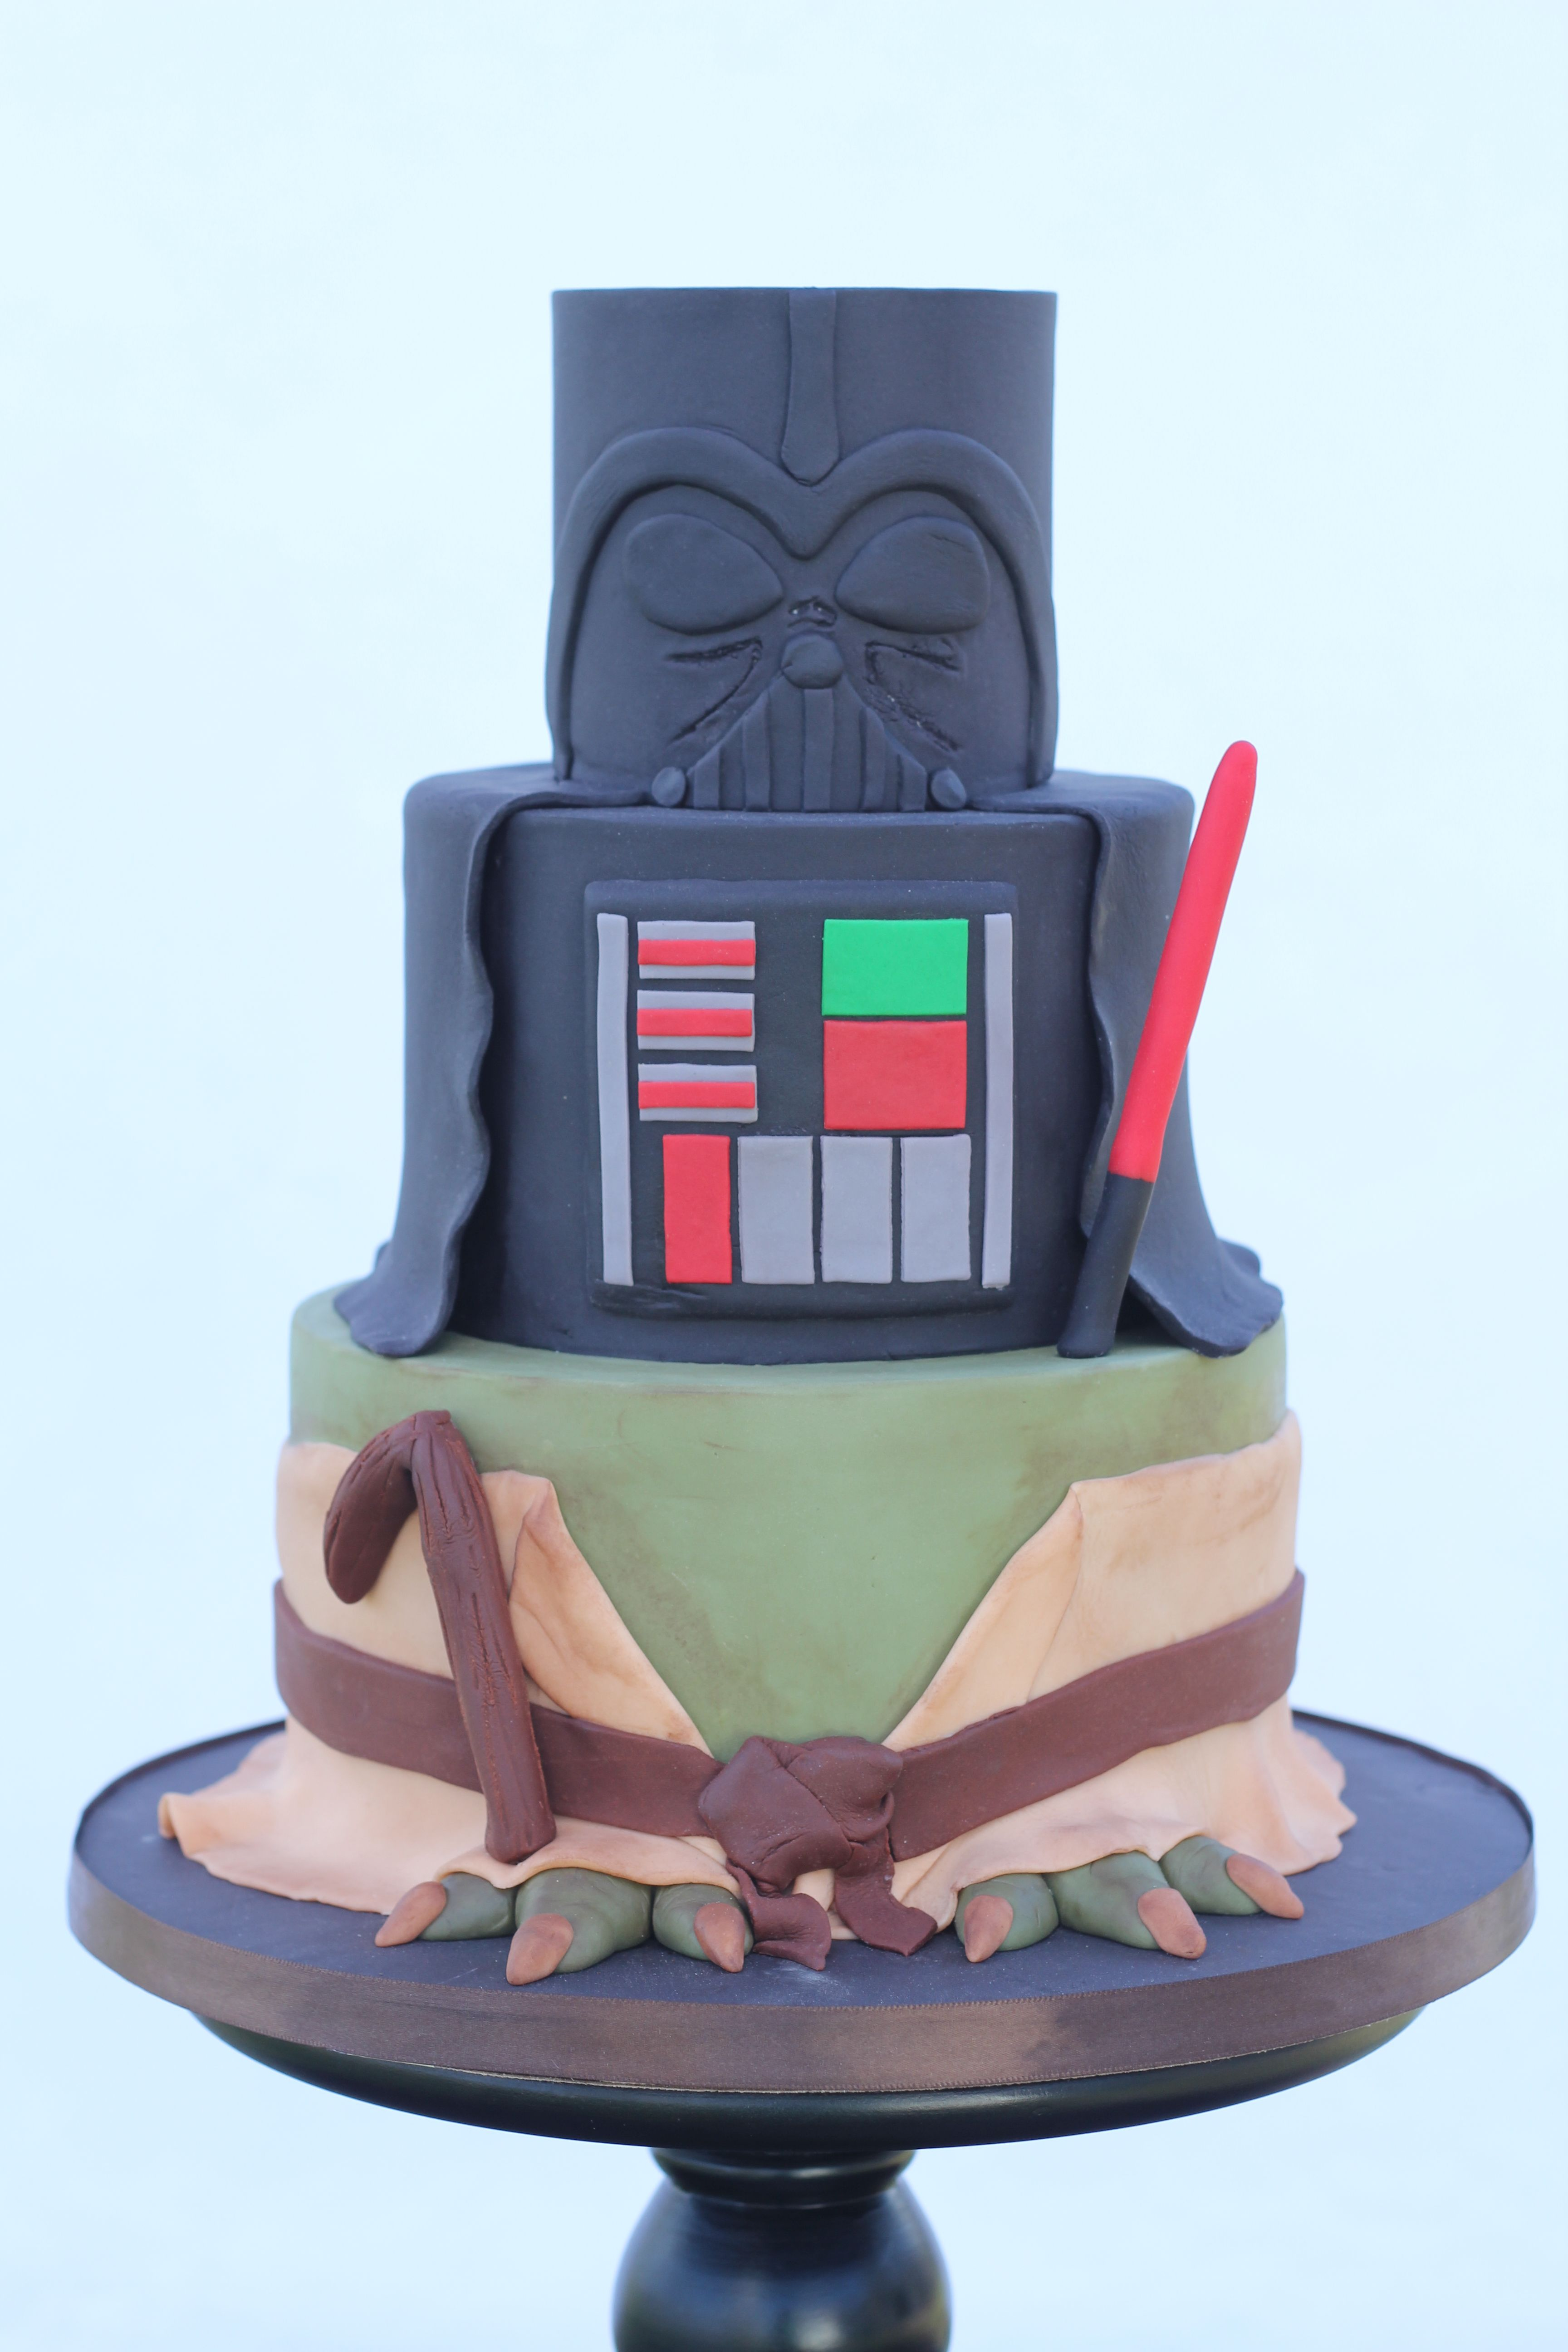 Pleasant Birthday Cakes Star Wars Birthday Cake Cake Cake Design Funny Birthday Cards Online Alyptdamsfinfo